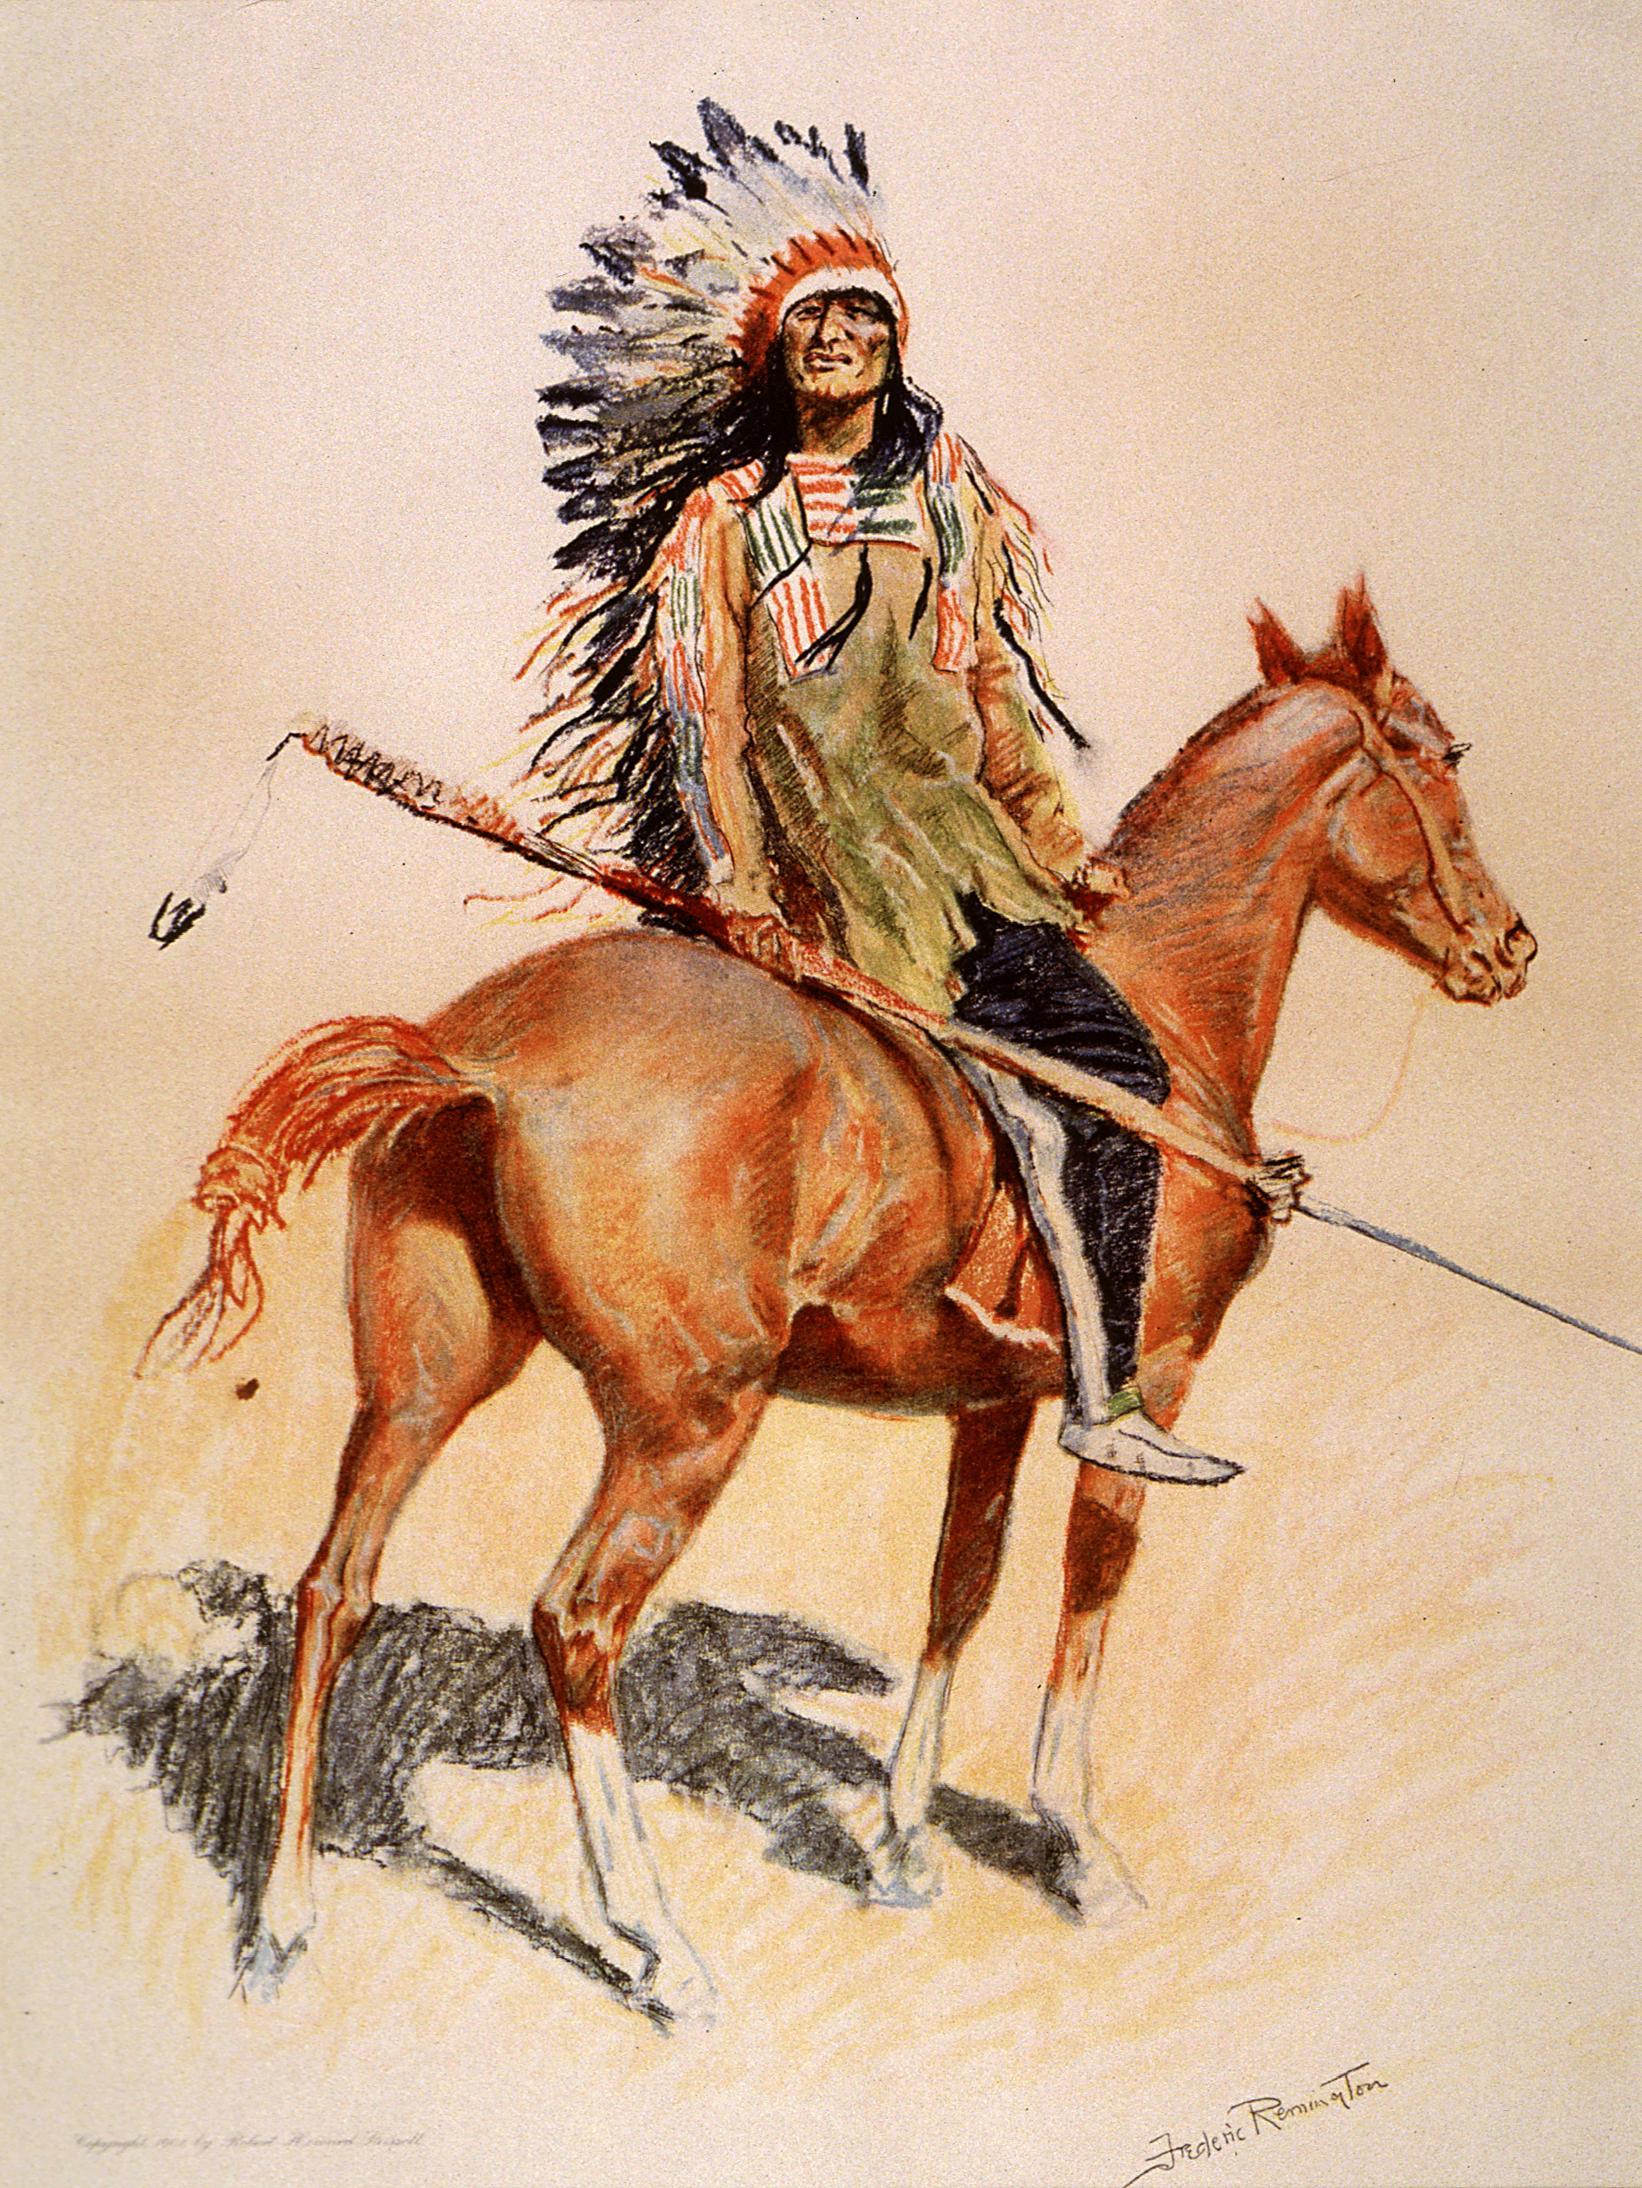 Famous American Western Artists: Remington, Russell, Catlin, Bierstadt, and Moran